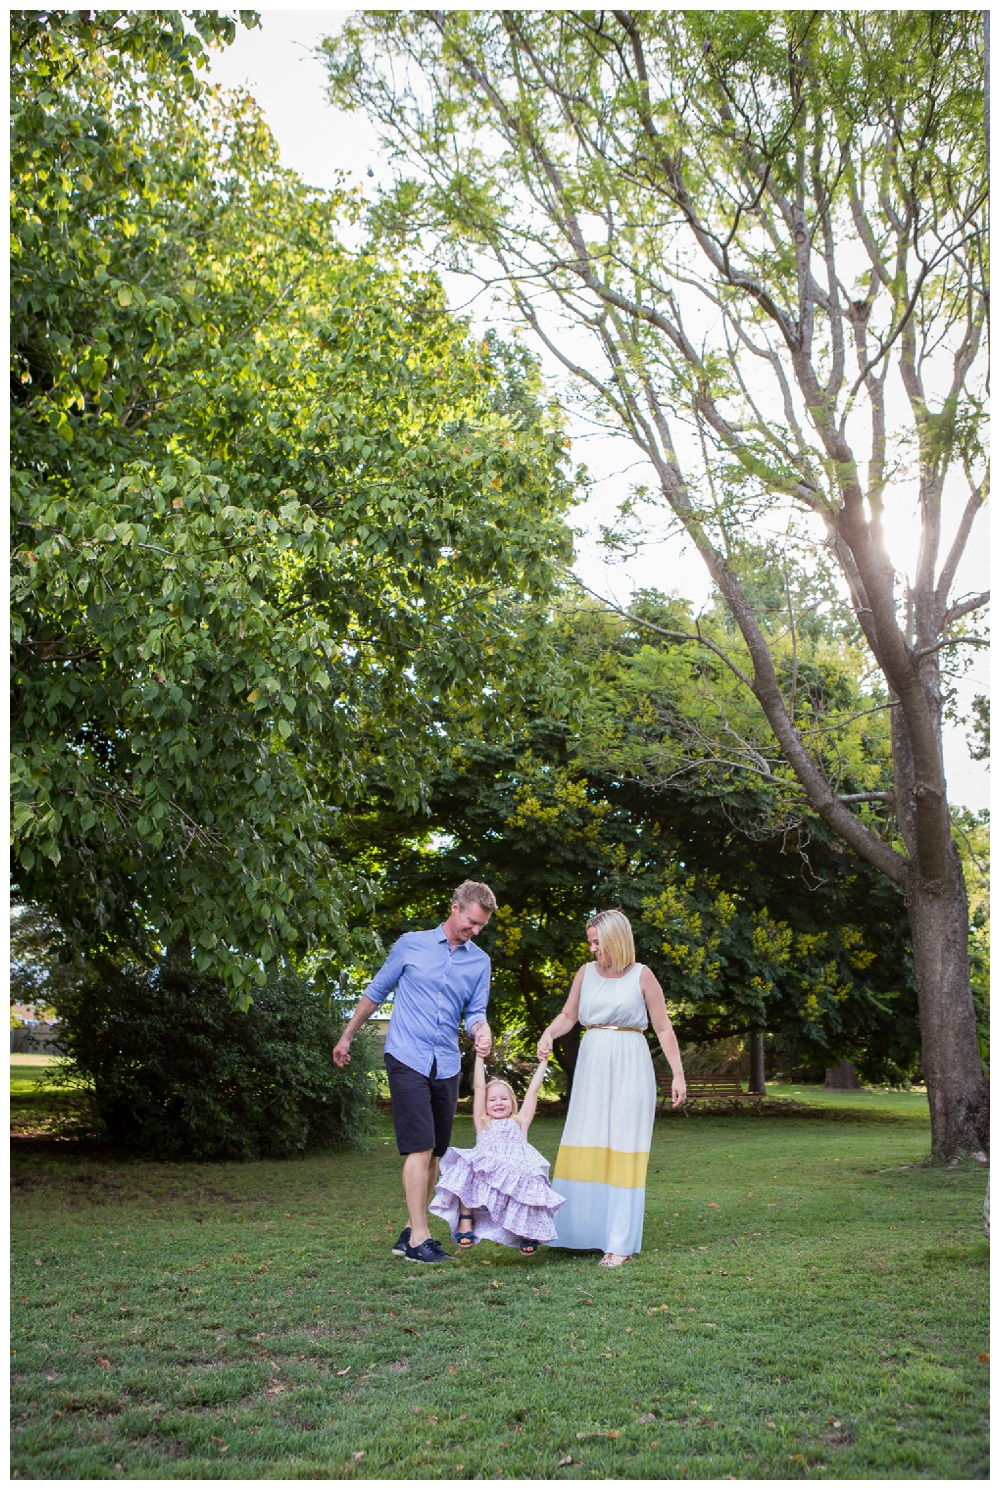 Maitland Family Photographer